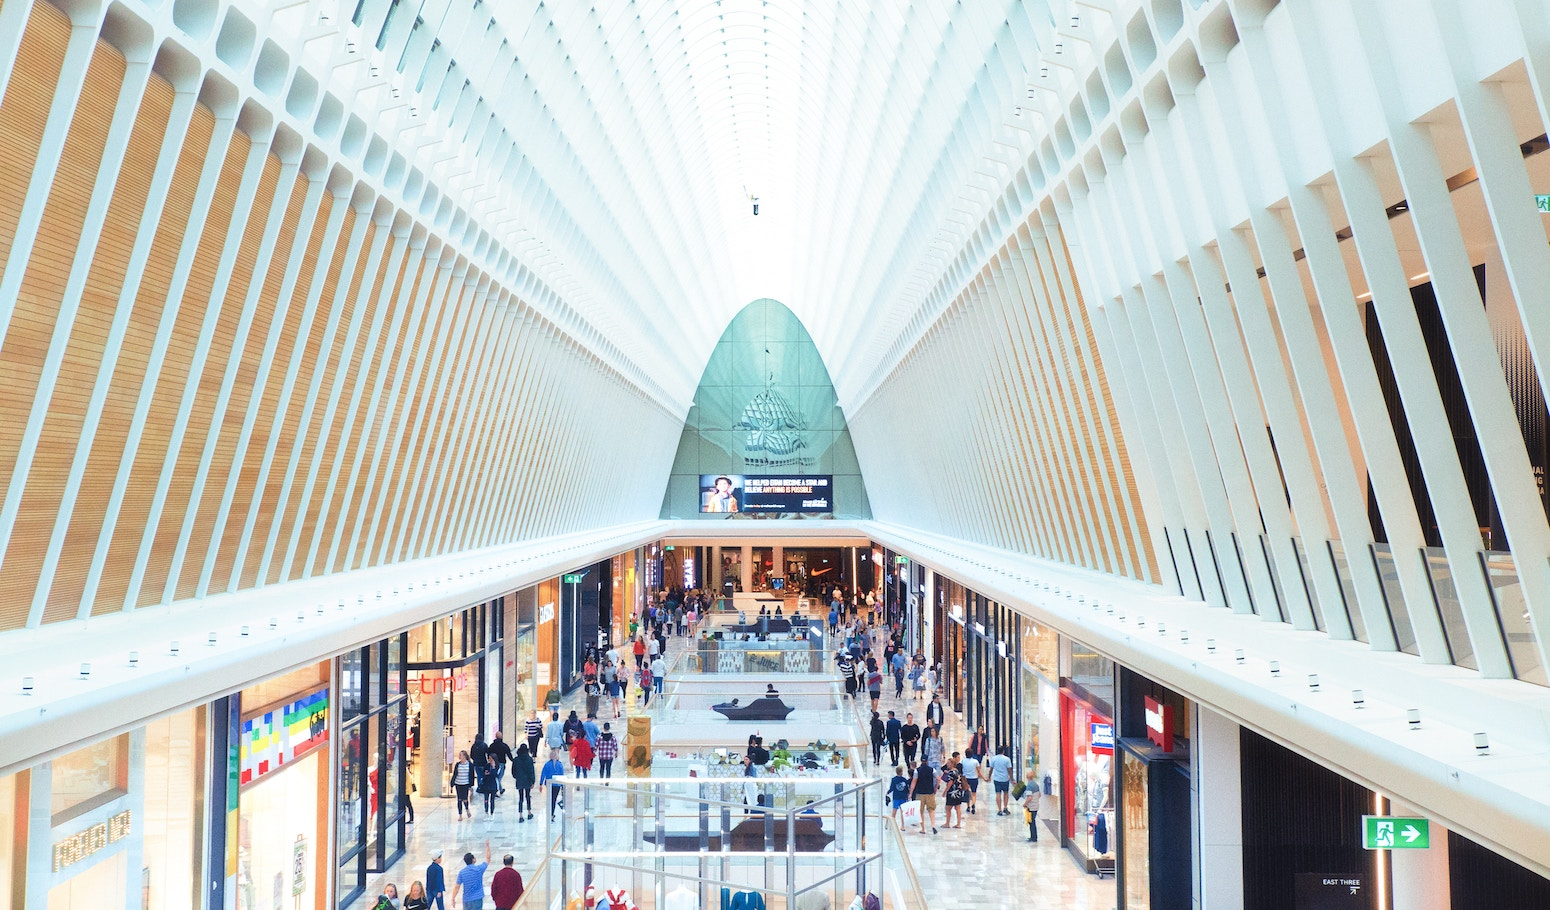 three-reasons-gen-z-are-set-to-spark-a-retail-renaissance